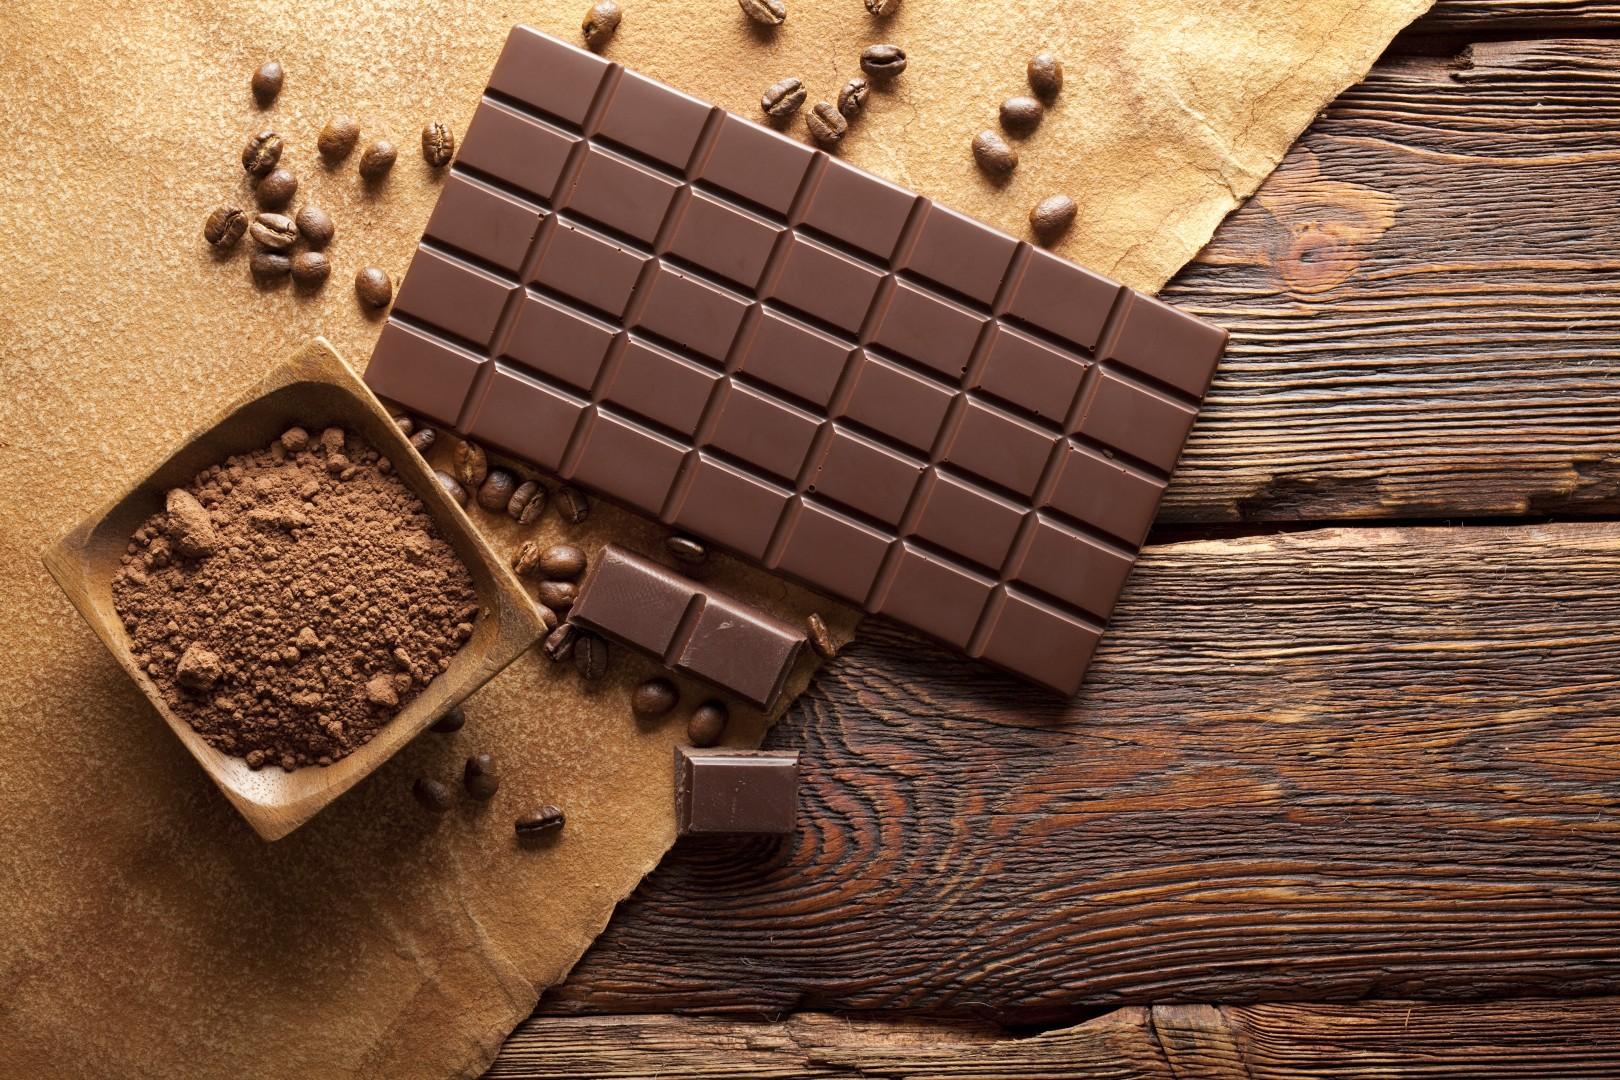 Шоколад и какао для глазури